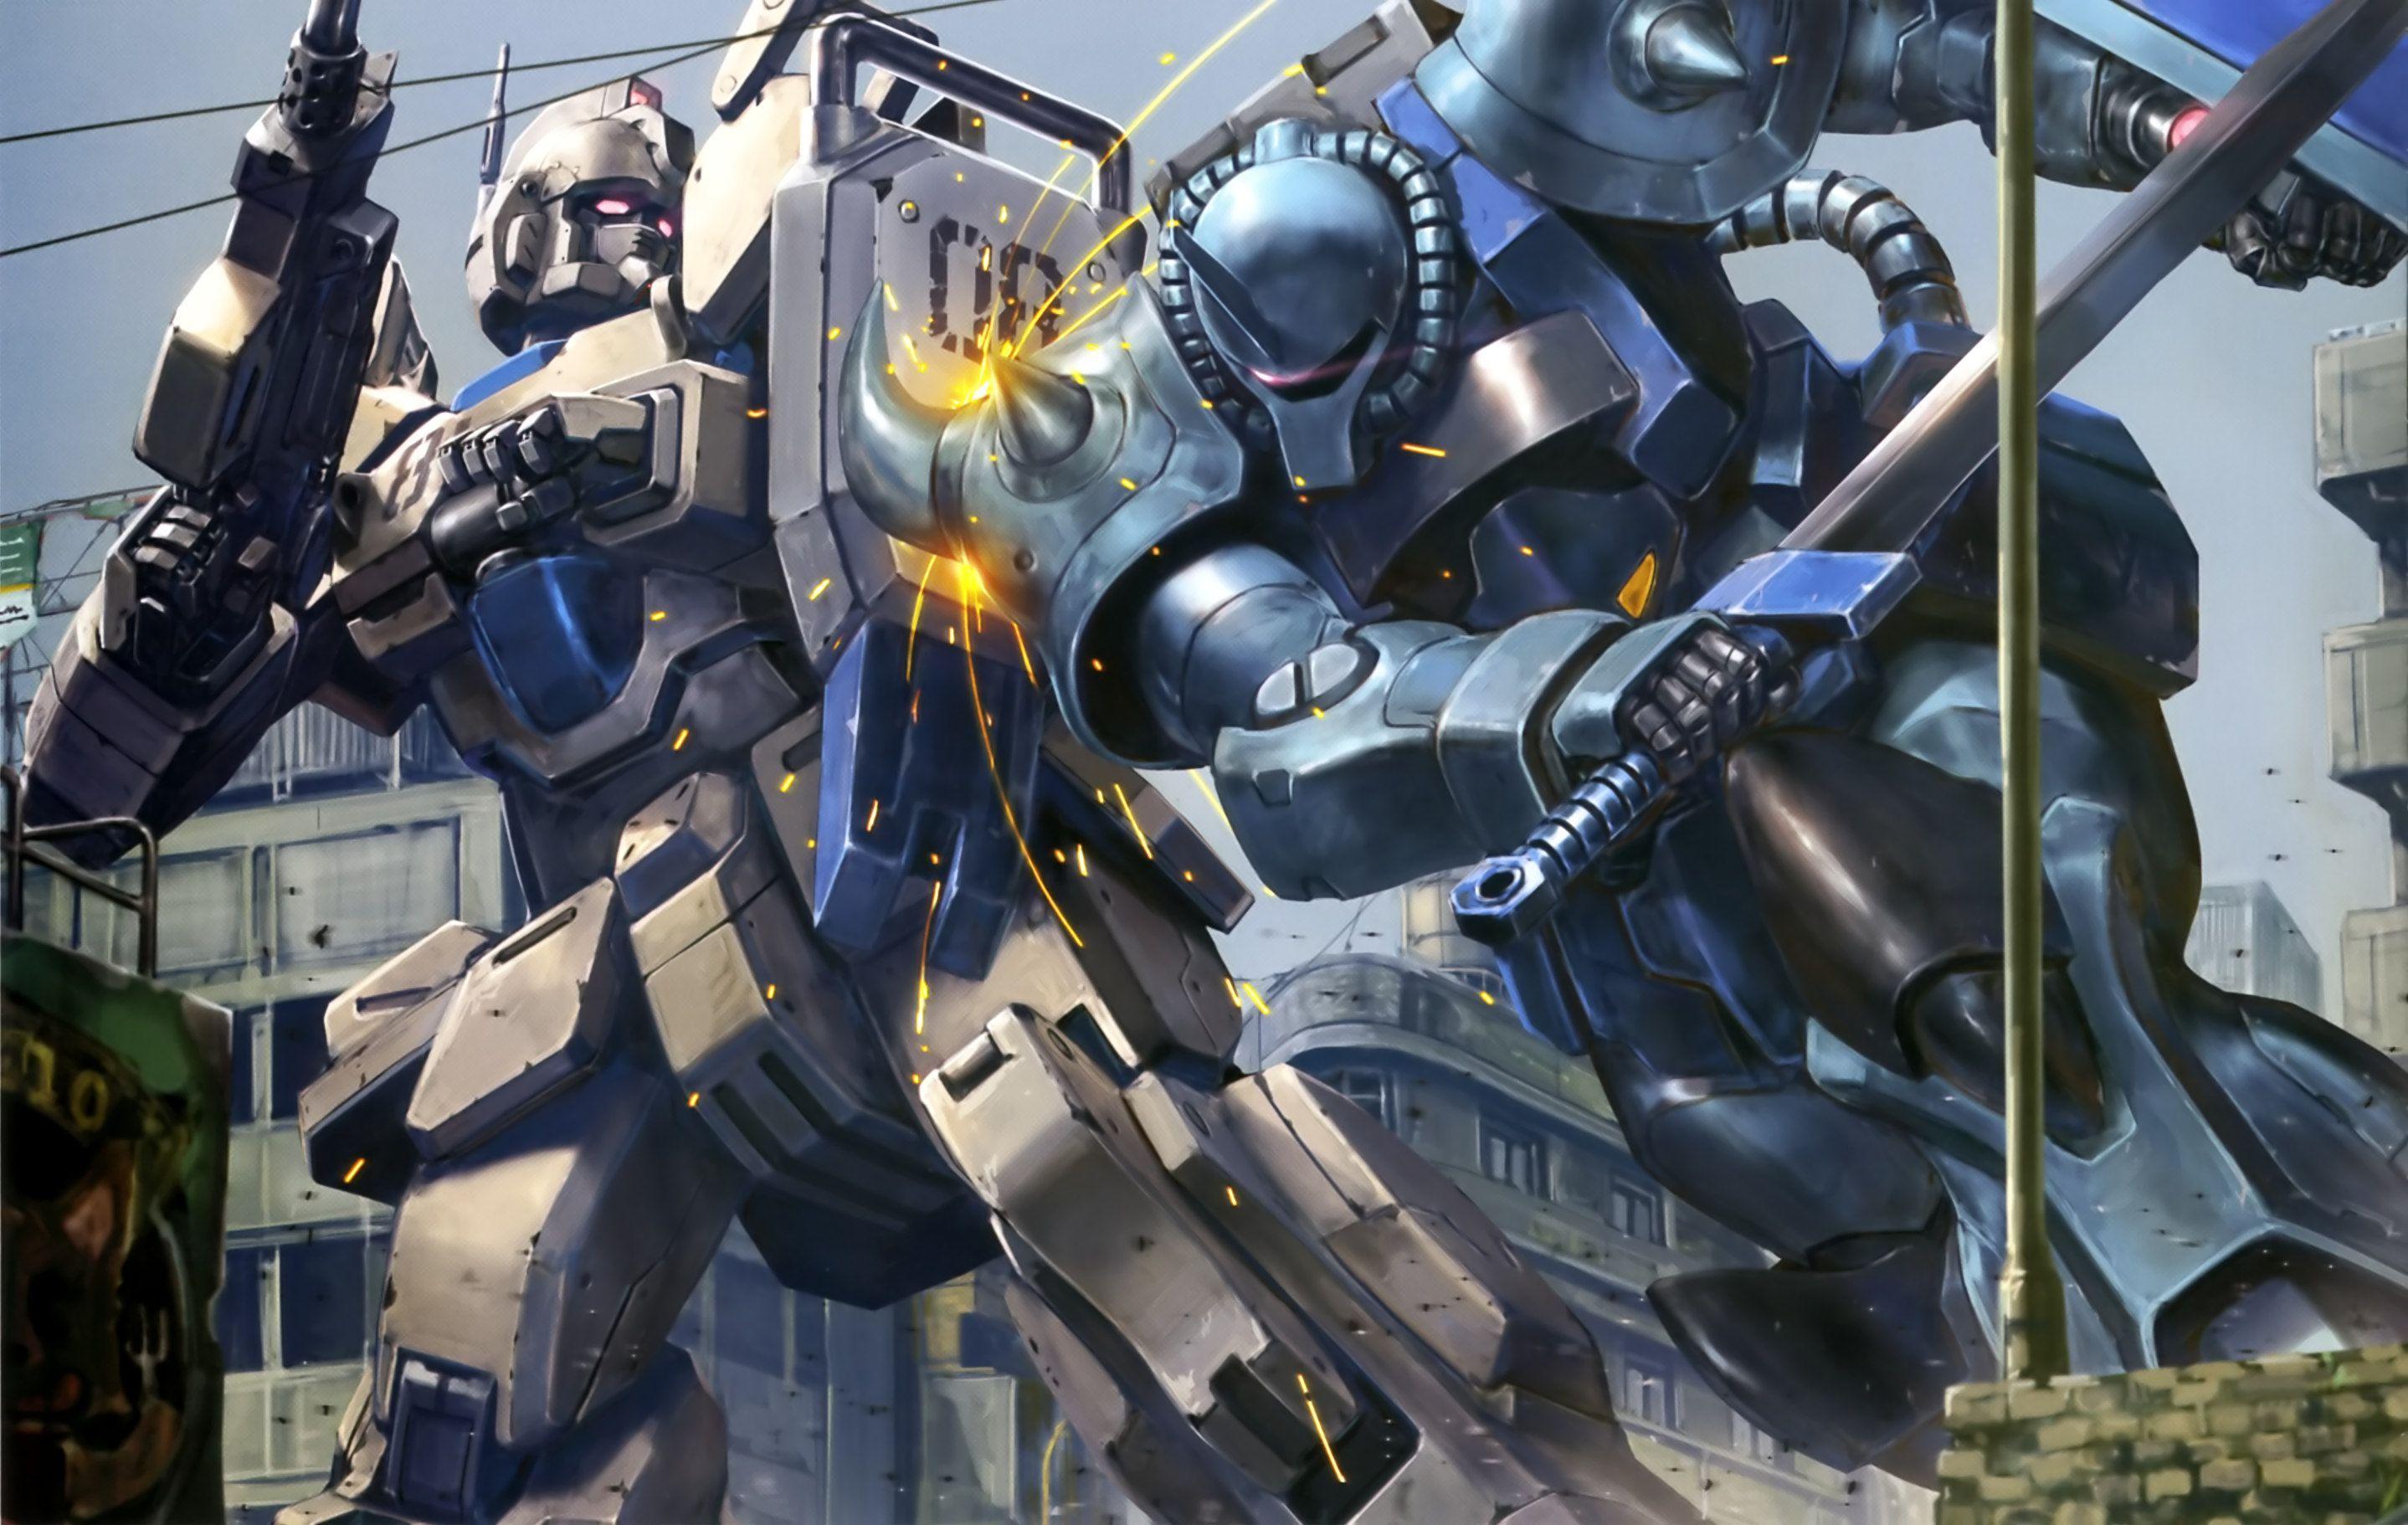 Wallpapers Gundam - Wallpaper Cave